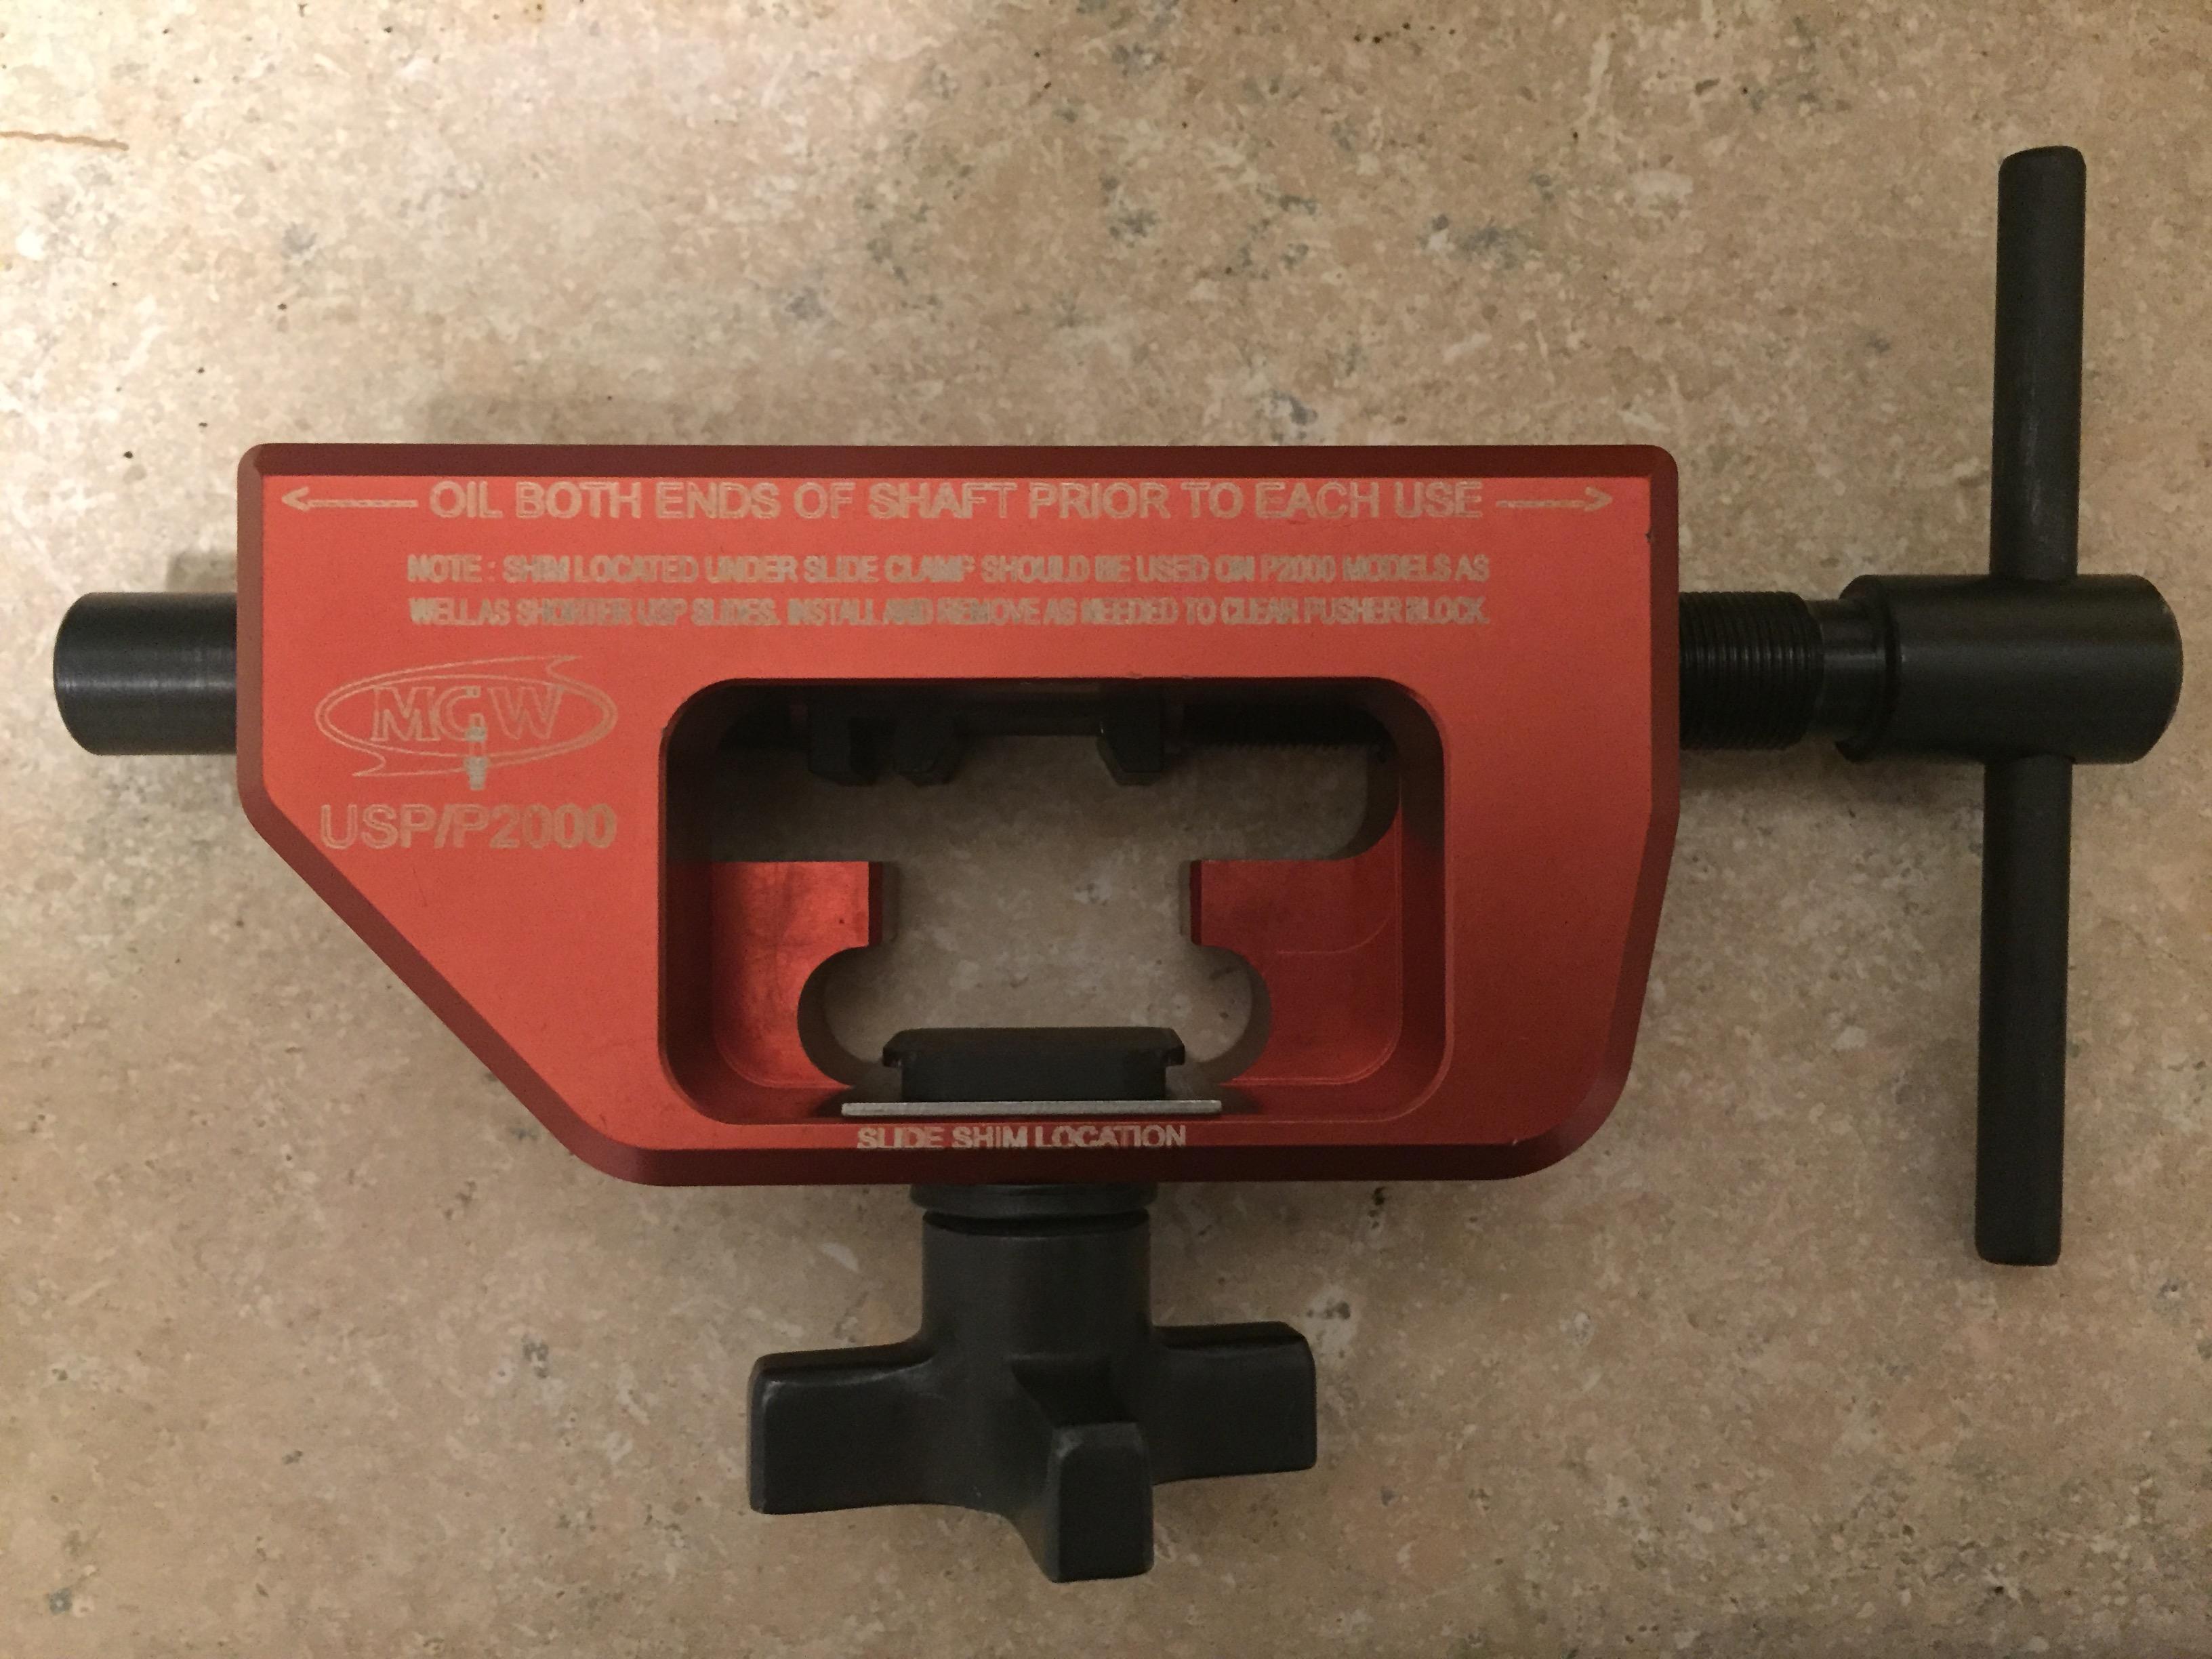 WTS: USP Compact Magazines, Match Trigger Kit, Sight Pusher-img_1075.jpg